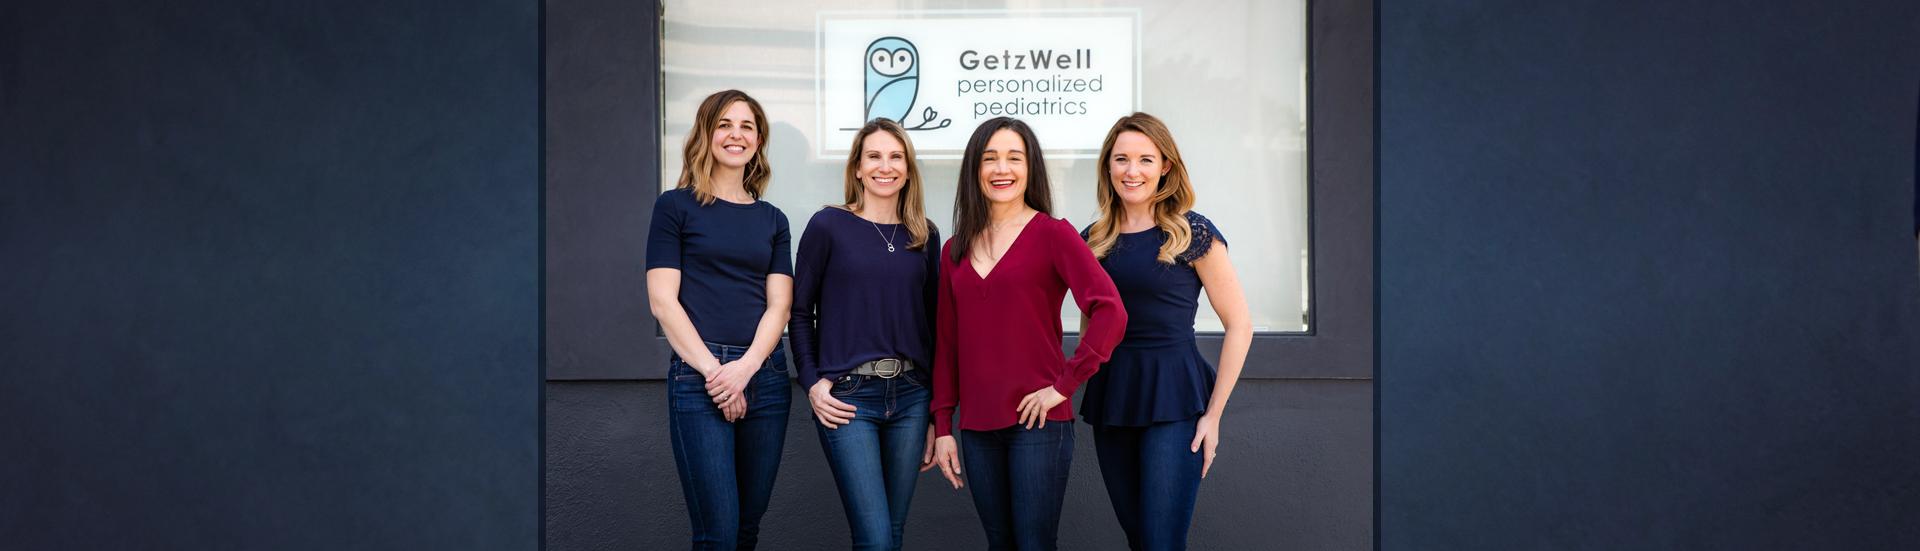 getzwell pediatrics staff banner